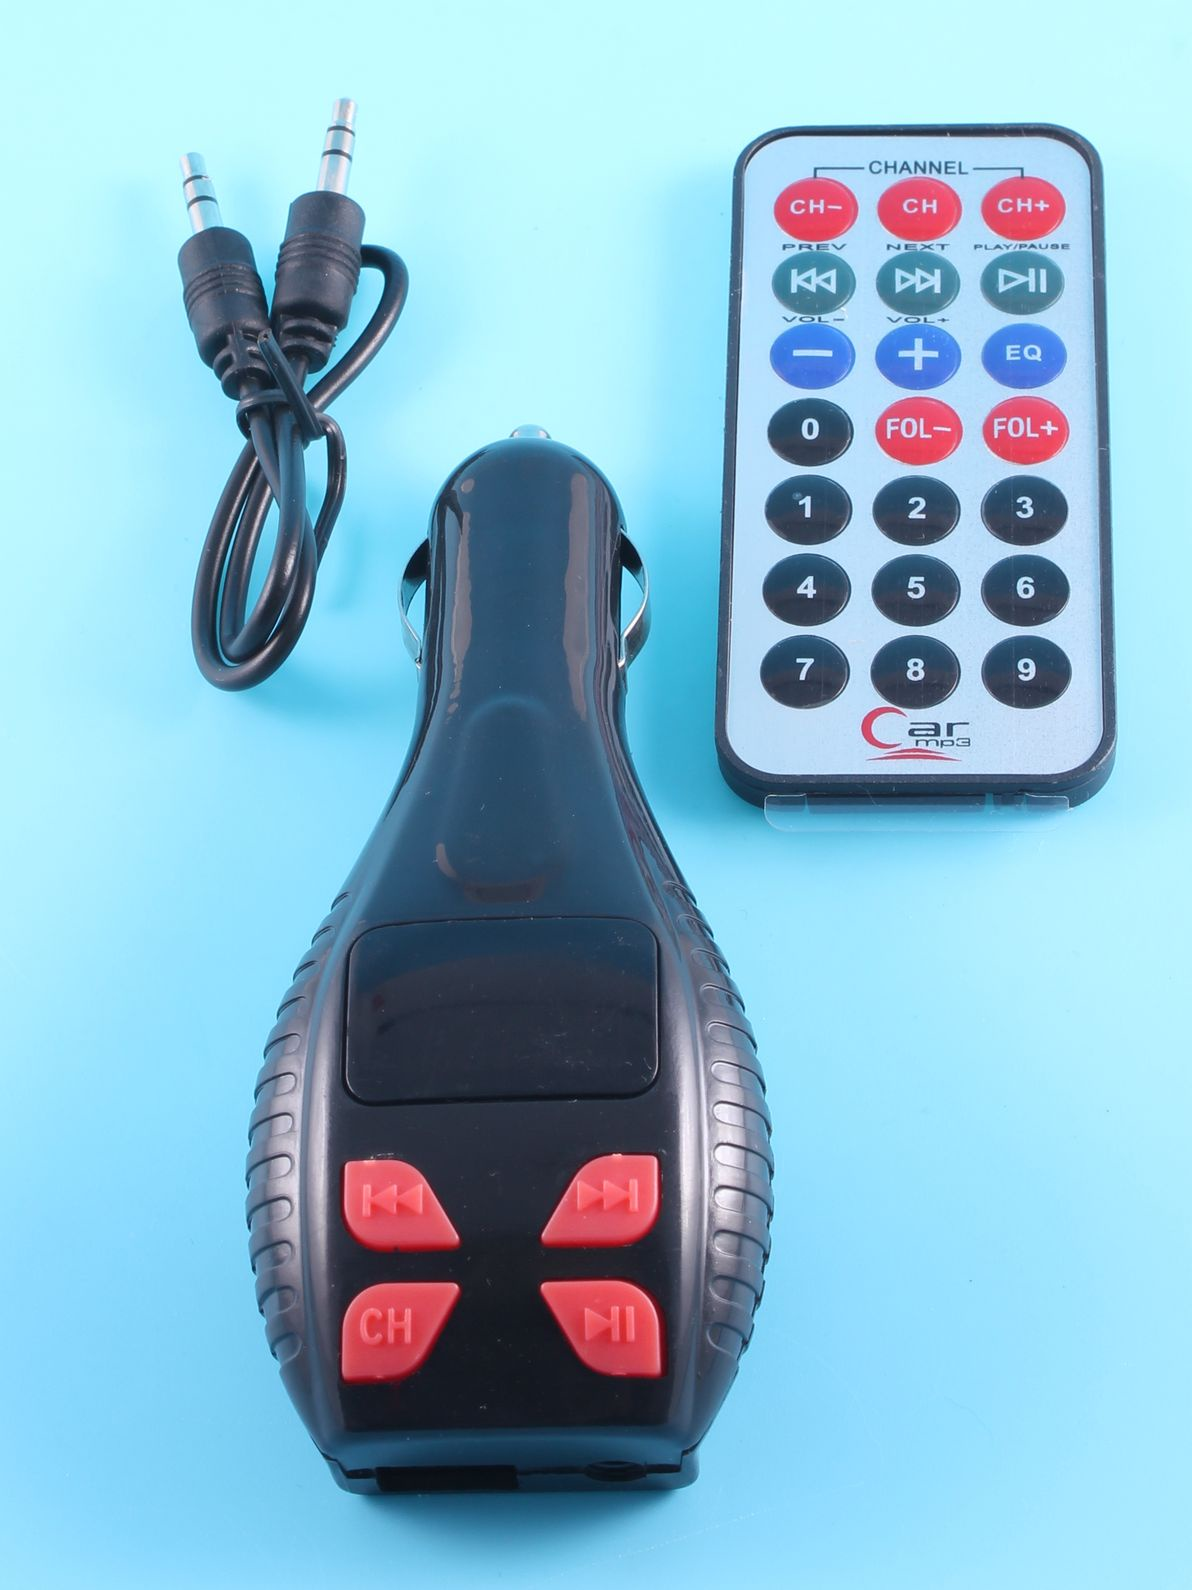 FM-модулятор/трансмиттер MIA PRO модулятор, 7426936750797 best quality single green pcb board tcs cdp pro no bluetooth cars